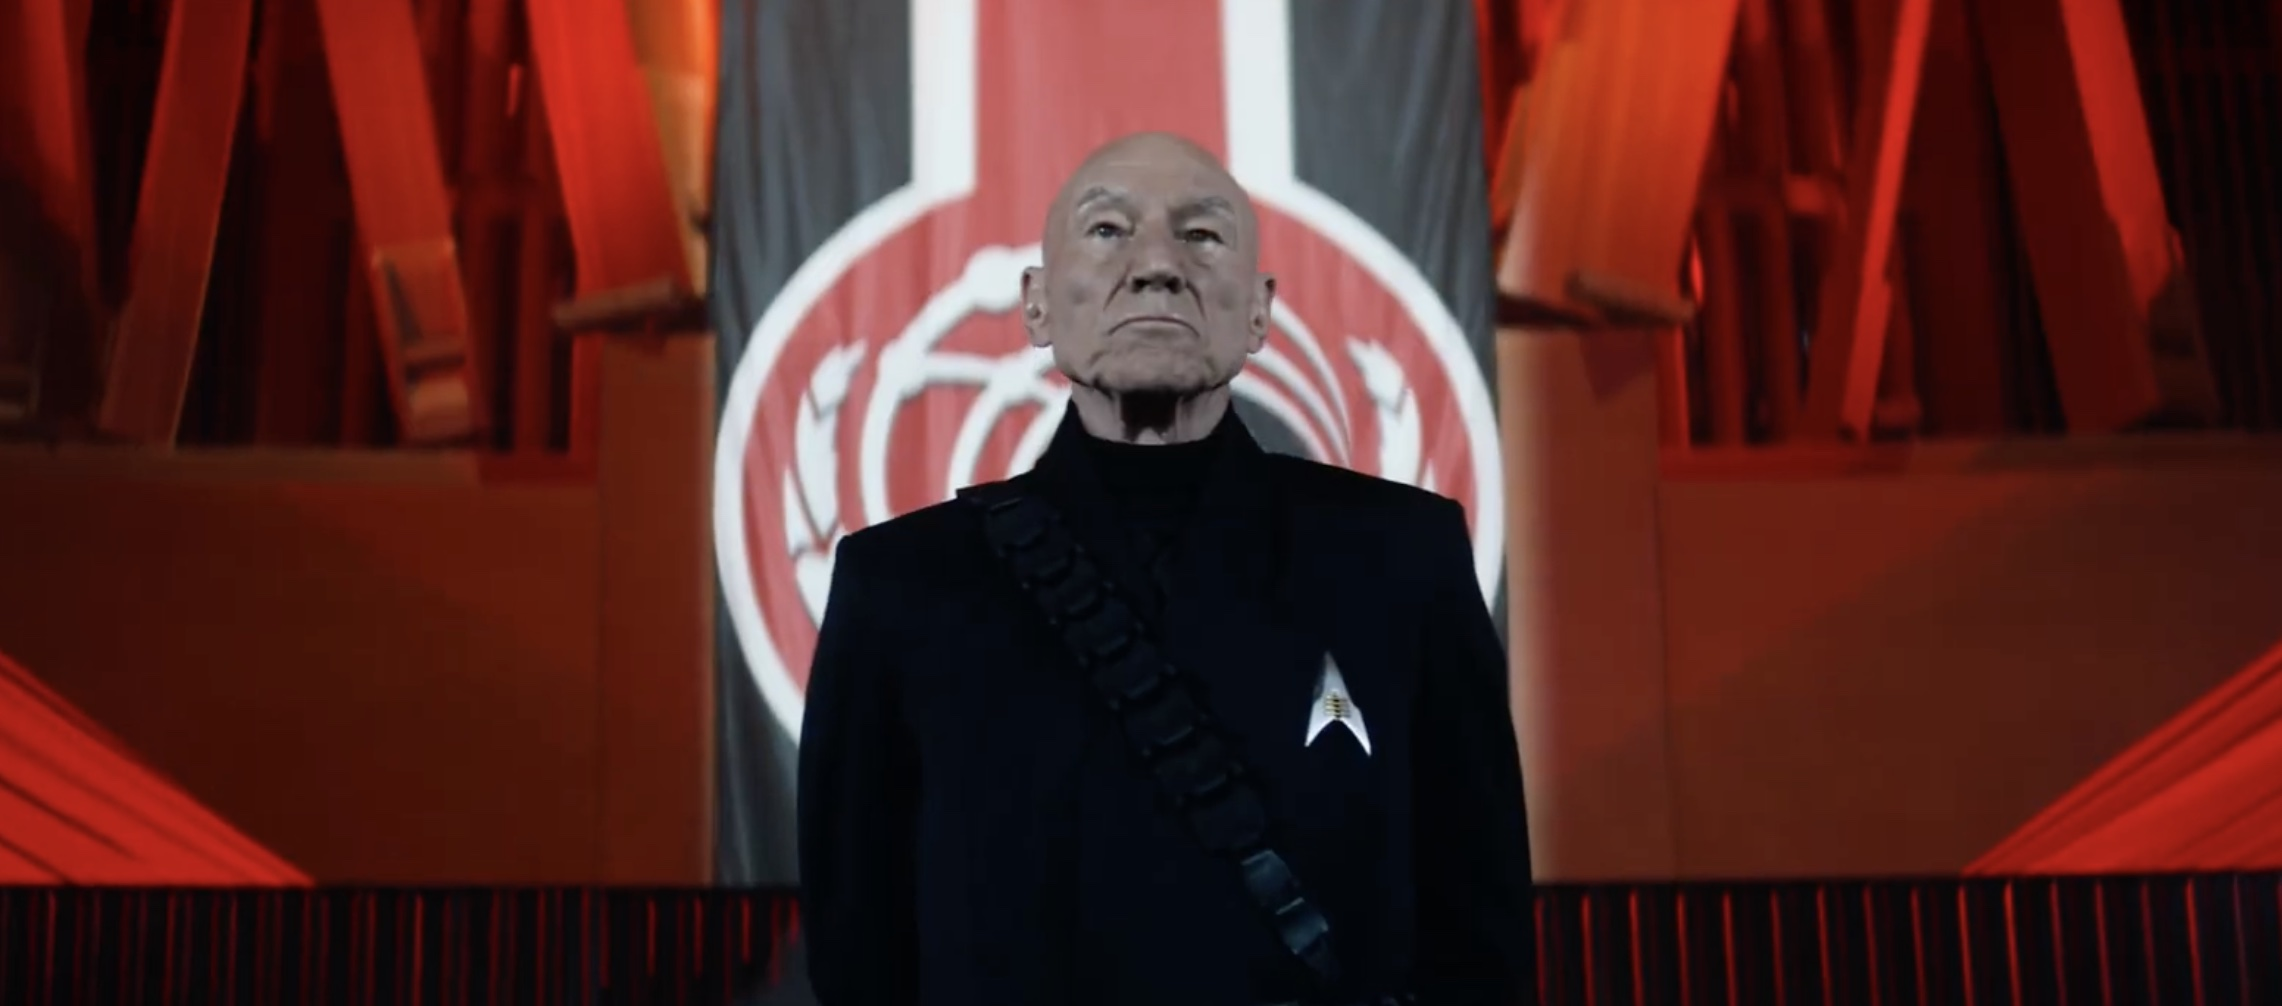 Star Trek: Picard season 2: The totalitarian Picard in an alternate timeline